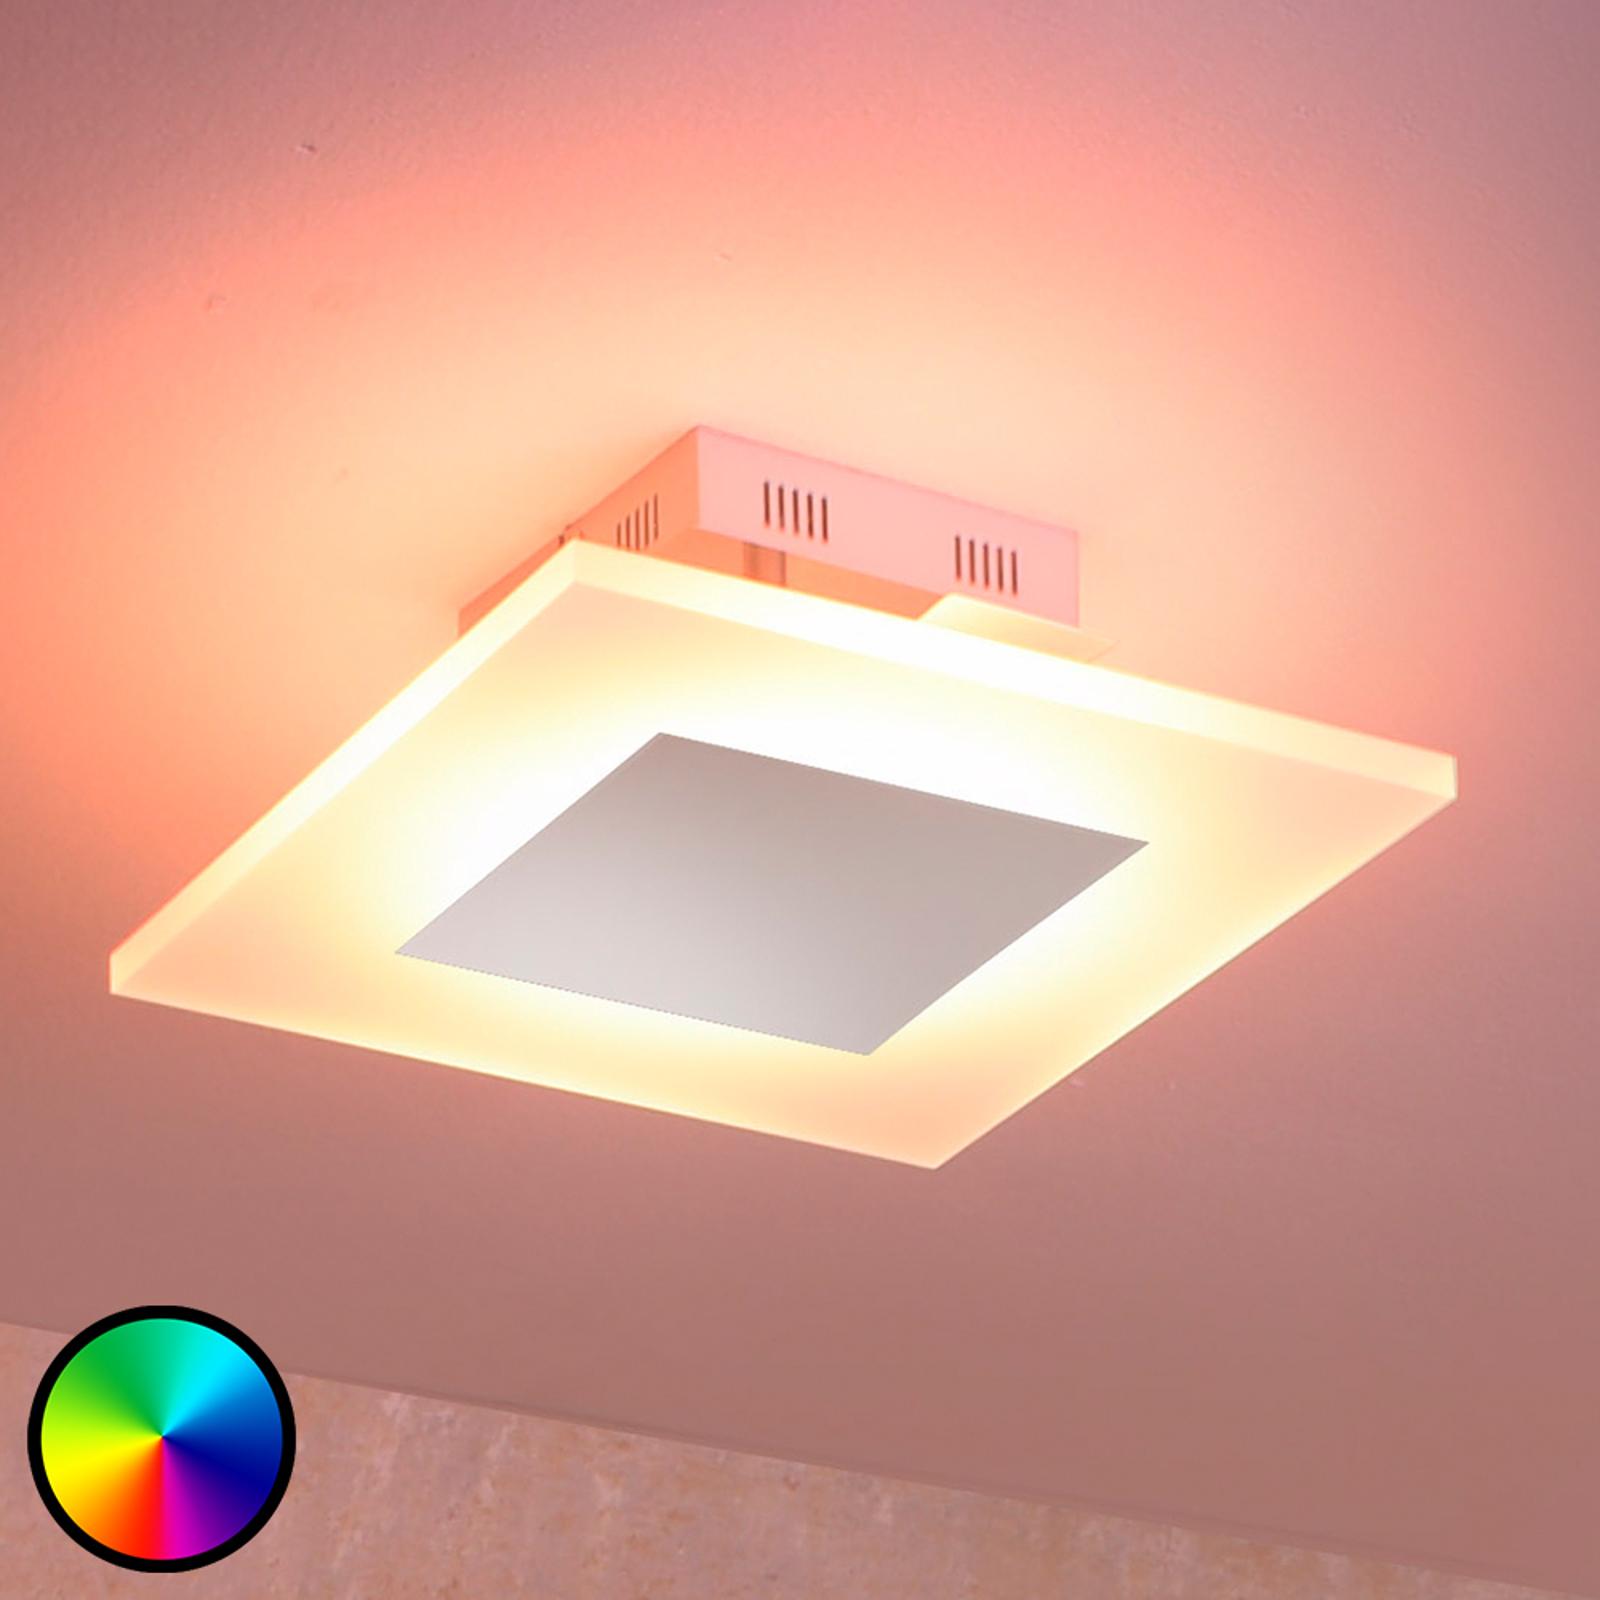 Acquista Plafoniera LED Frerk, colore di luce regolabile